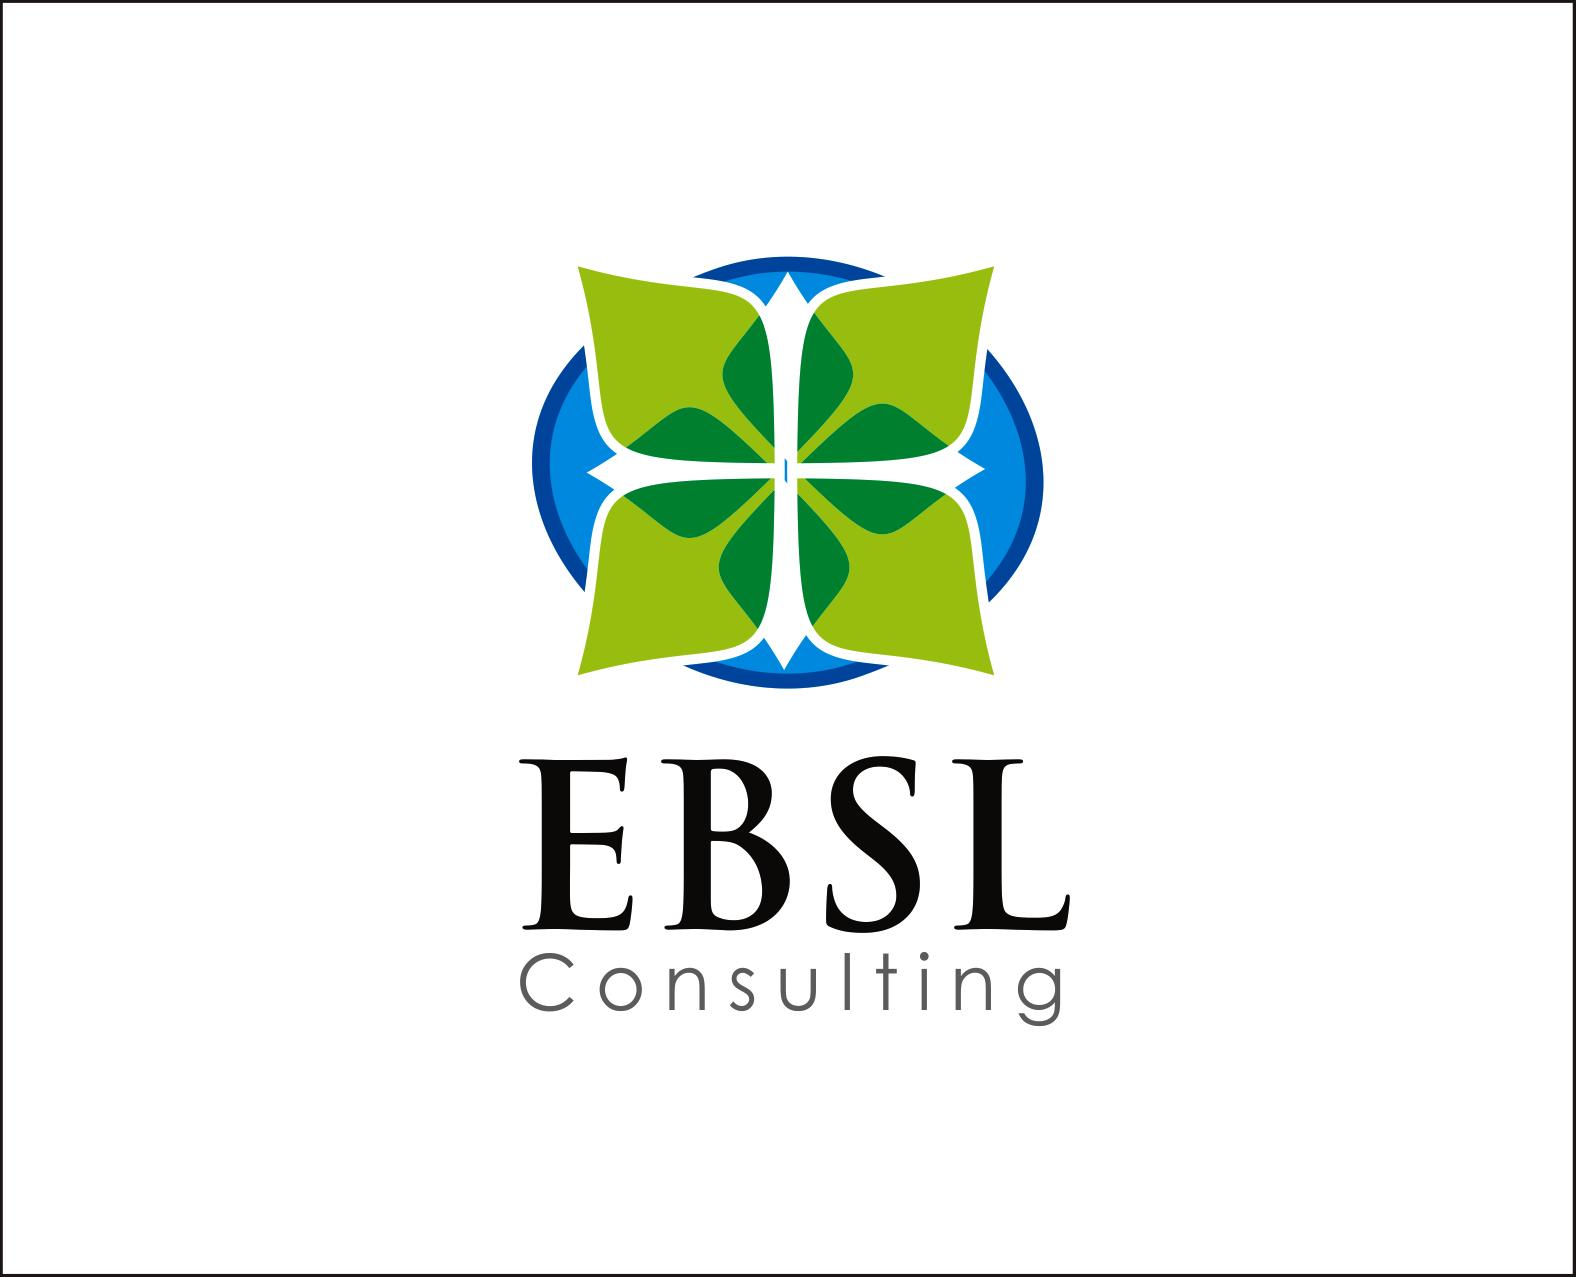 Logo Design by Armada Jamaluddin - Entry No. 101 in the Logo Design Contest EBSL Consulting Logo Design.